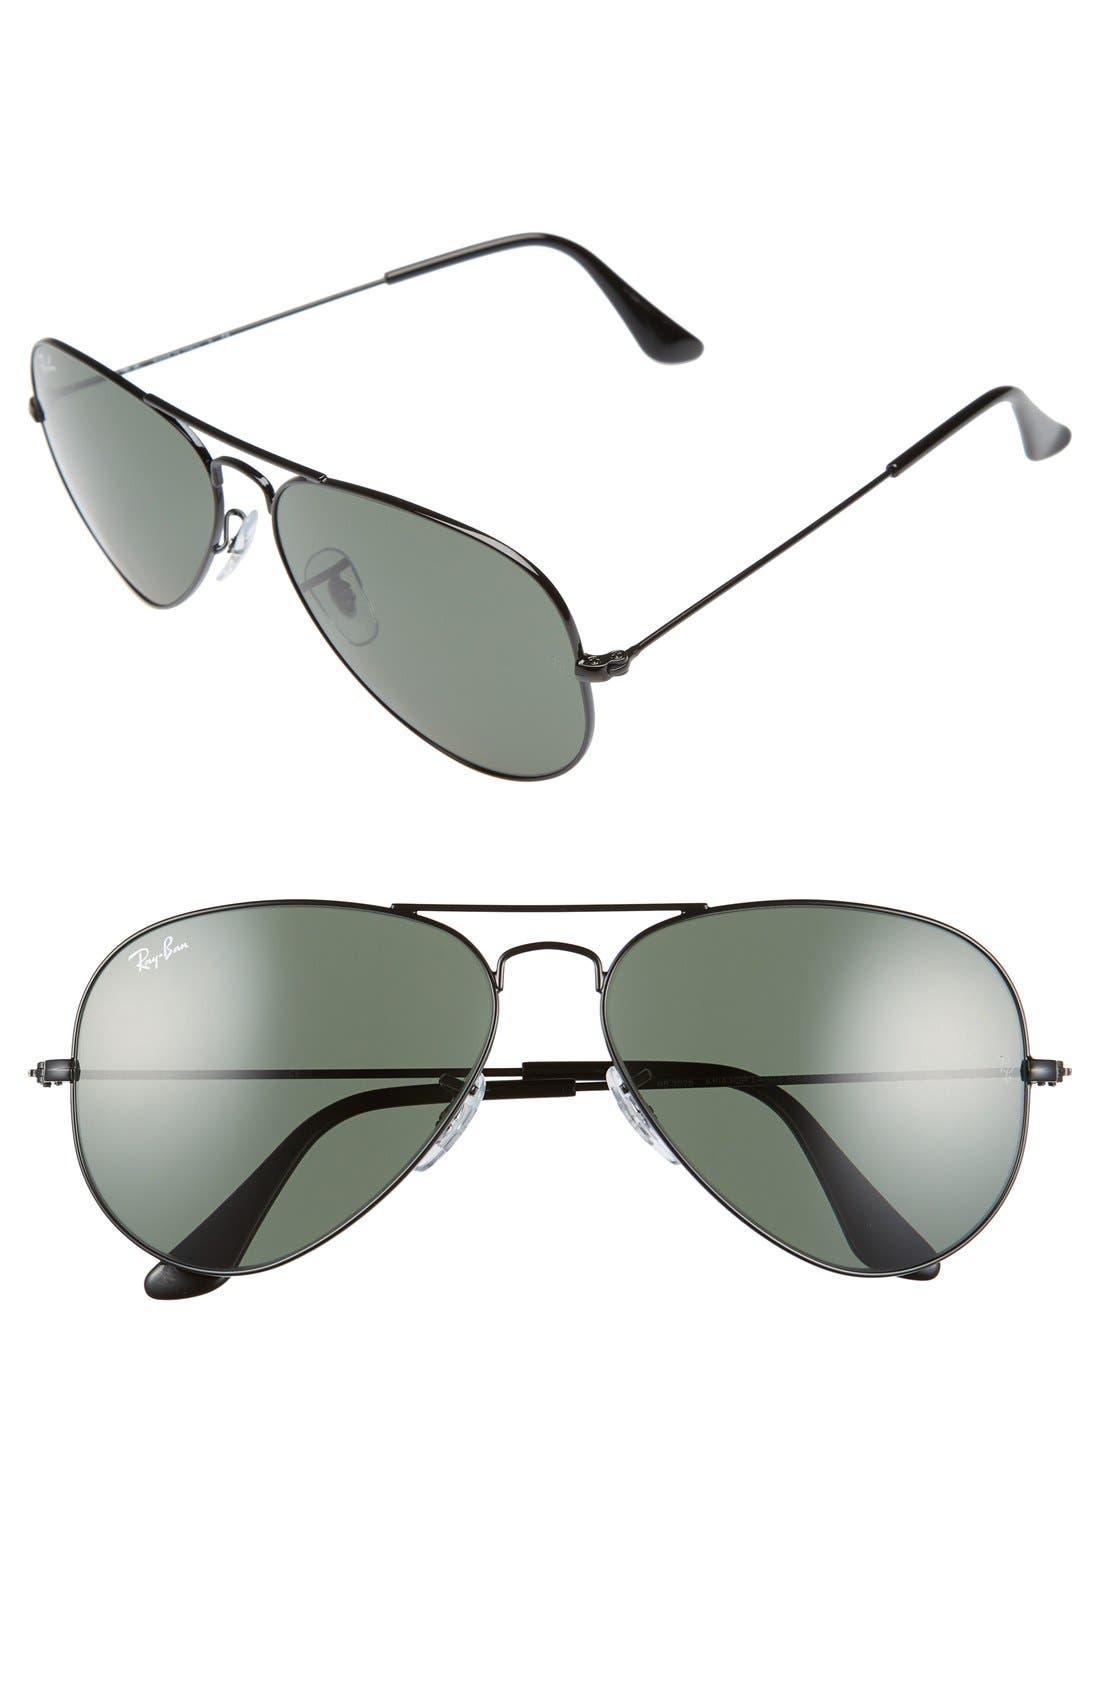 Original Aviator 58mm Sunglasses,                             Main thumbnail 1, color,                             Black/ Grey Green